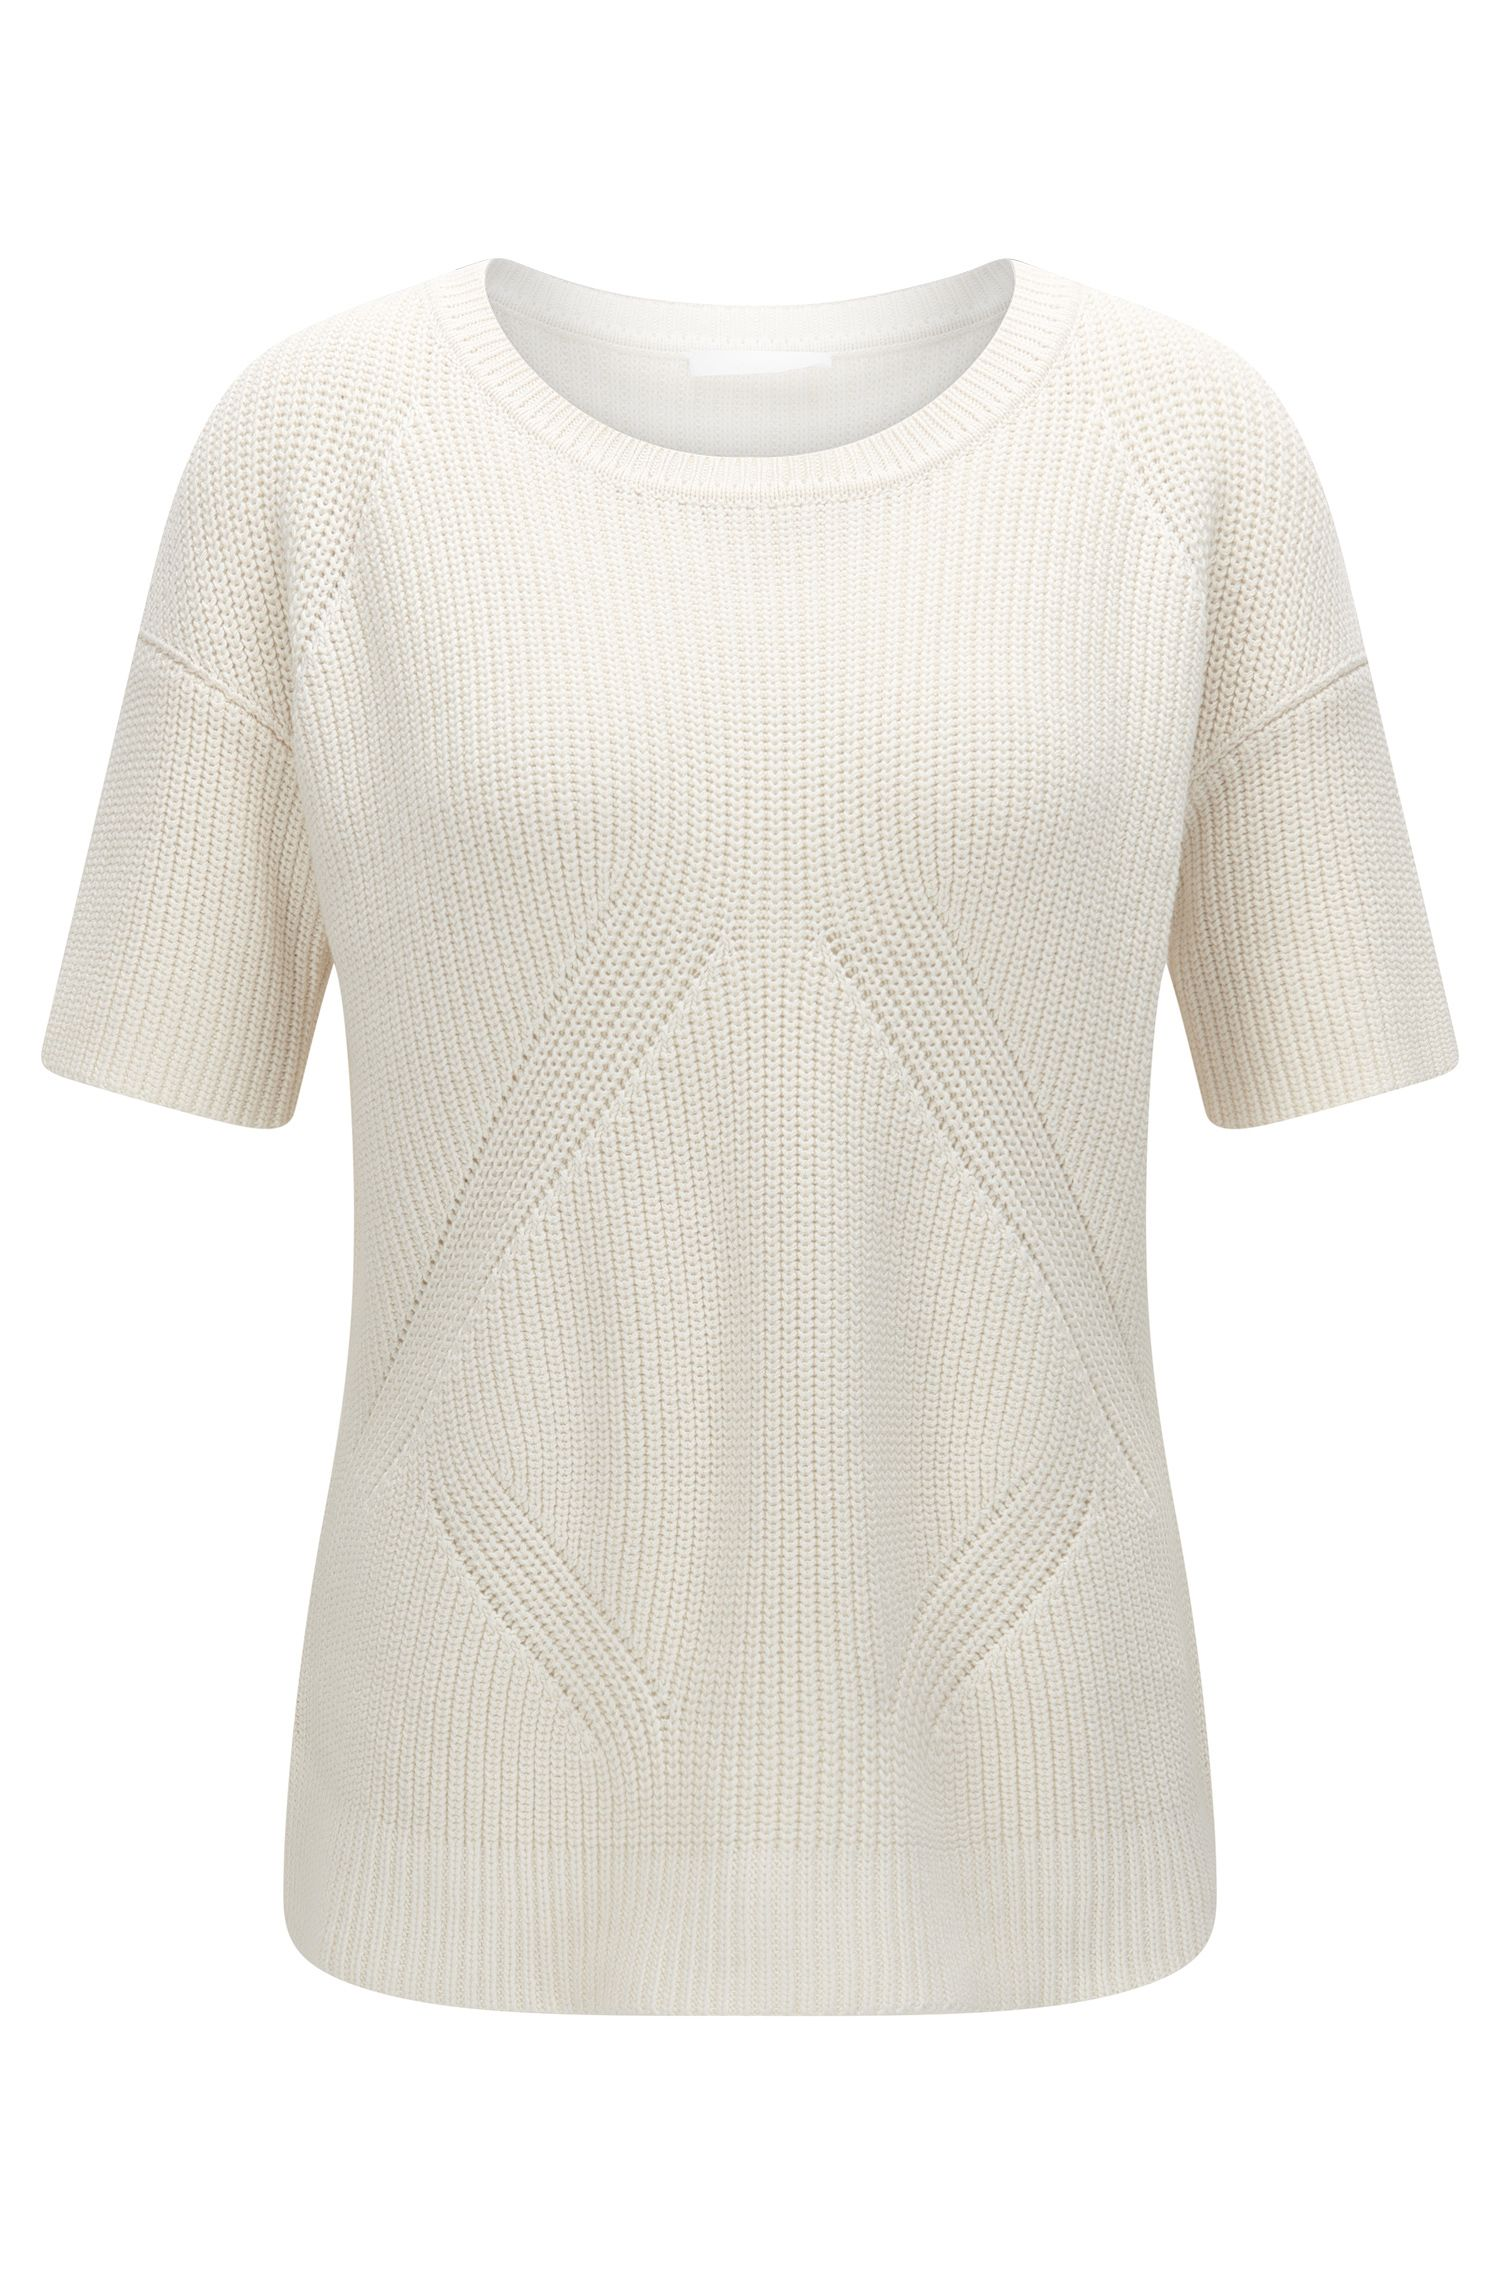 Cotton Silk Cashmere Knit Top | Fiola